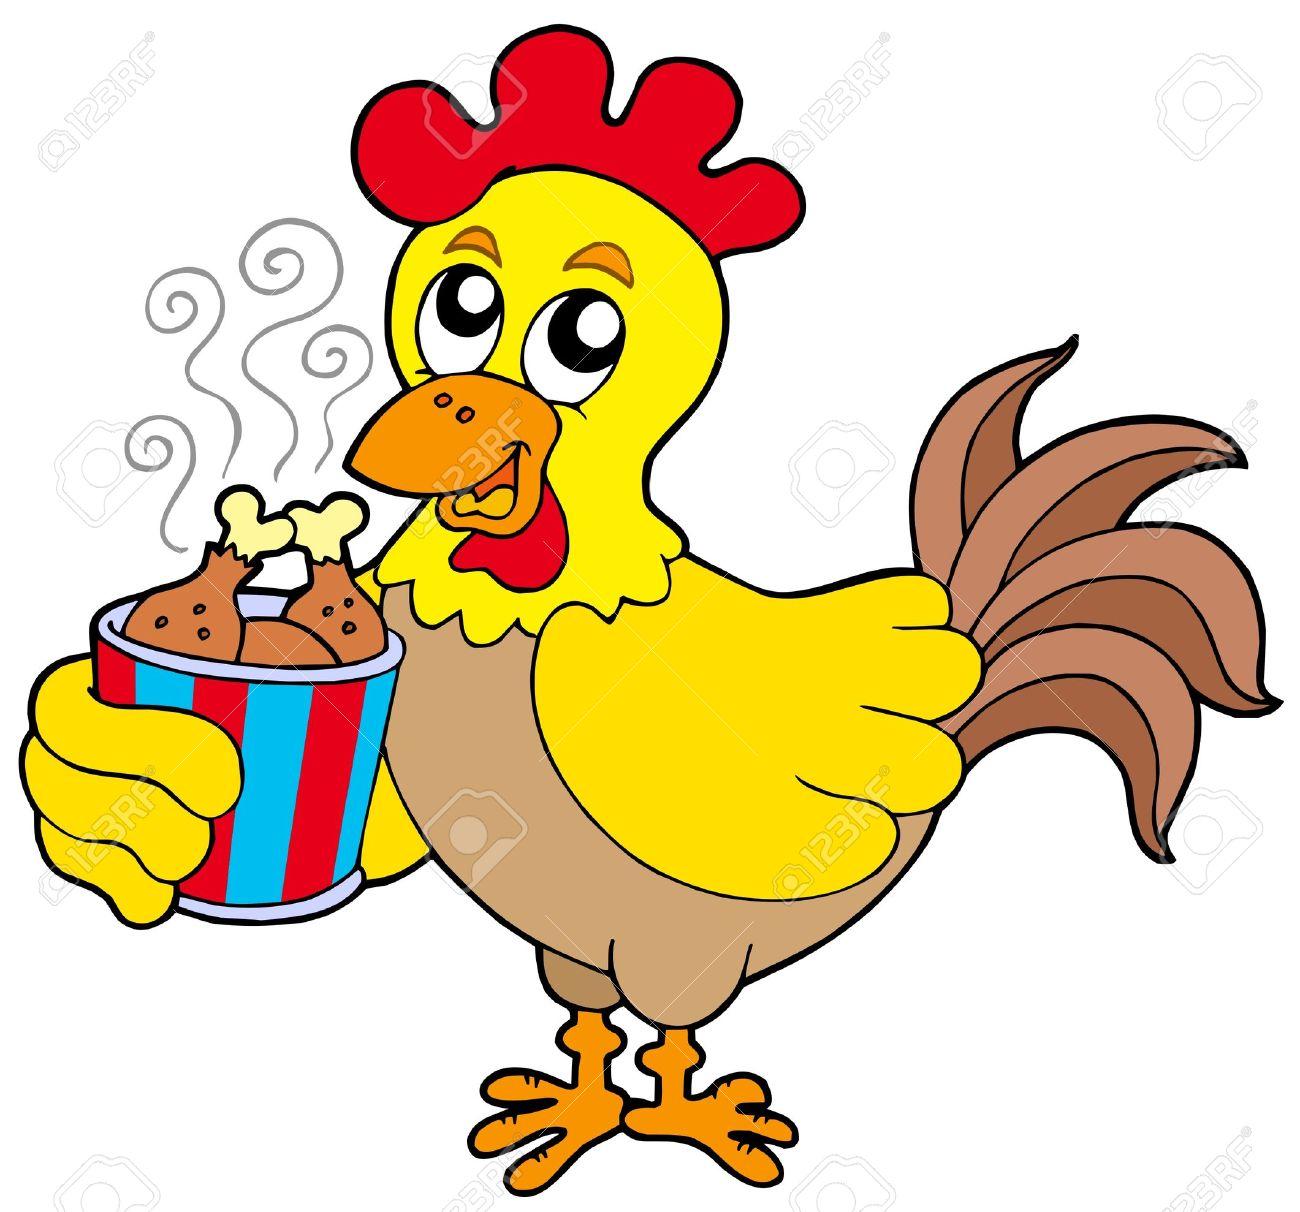 Cartoon chicken with meal box - vector illustration. Stock Vector - 6370095